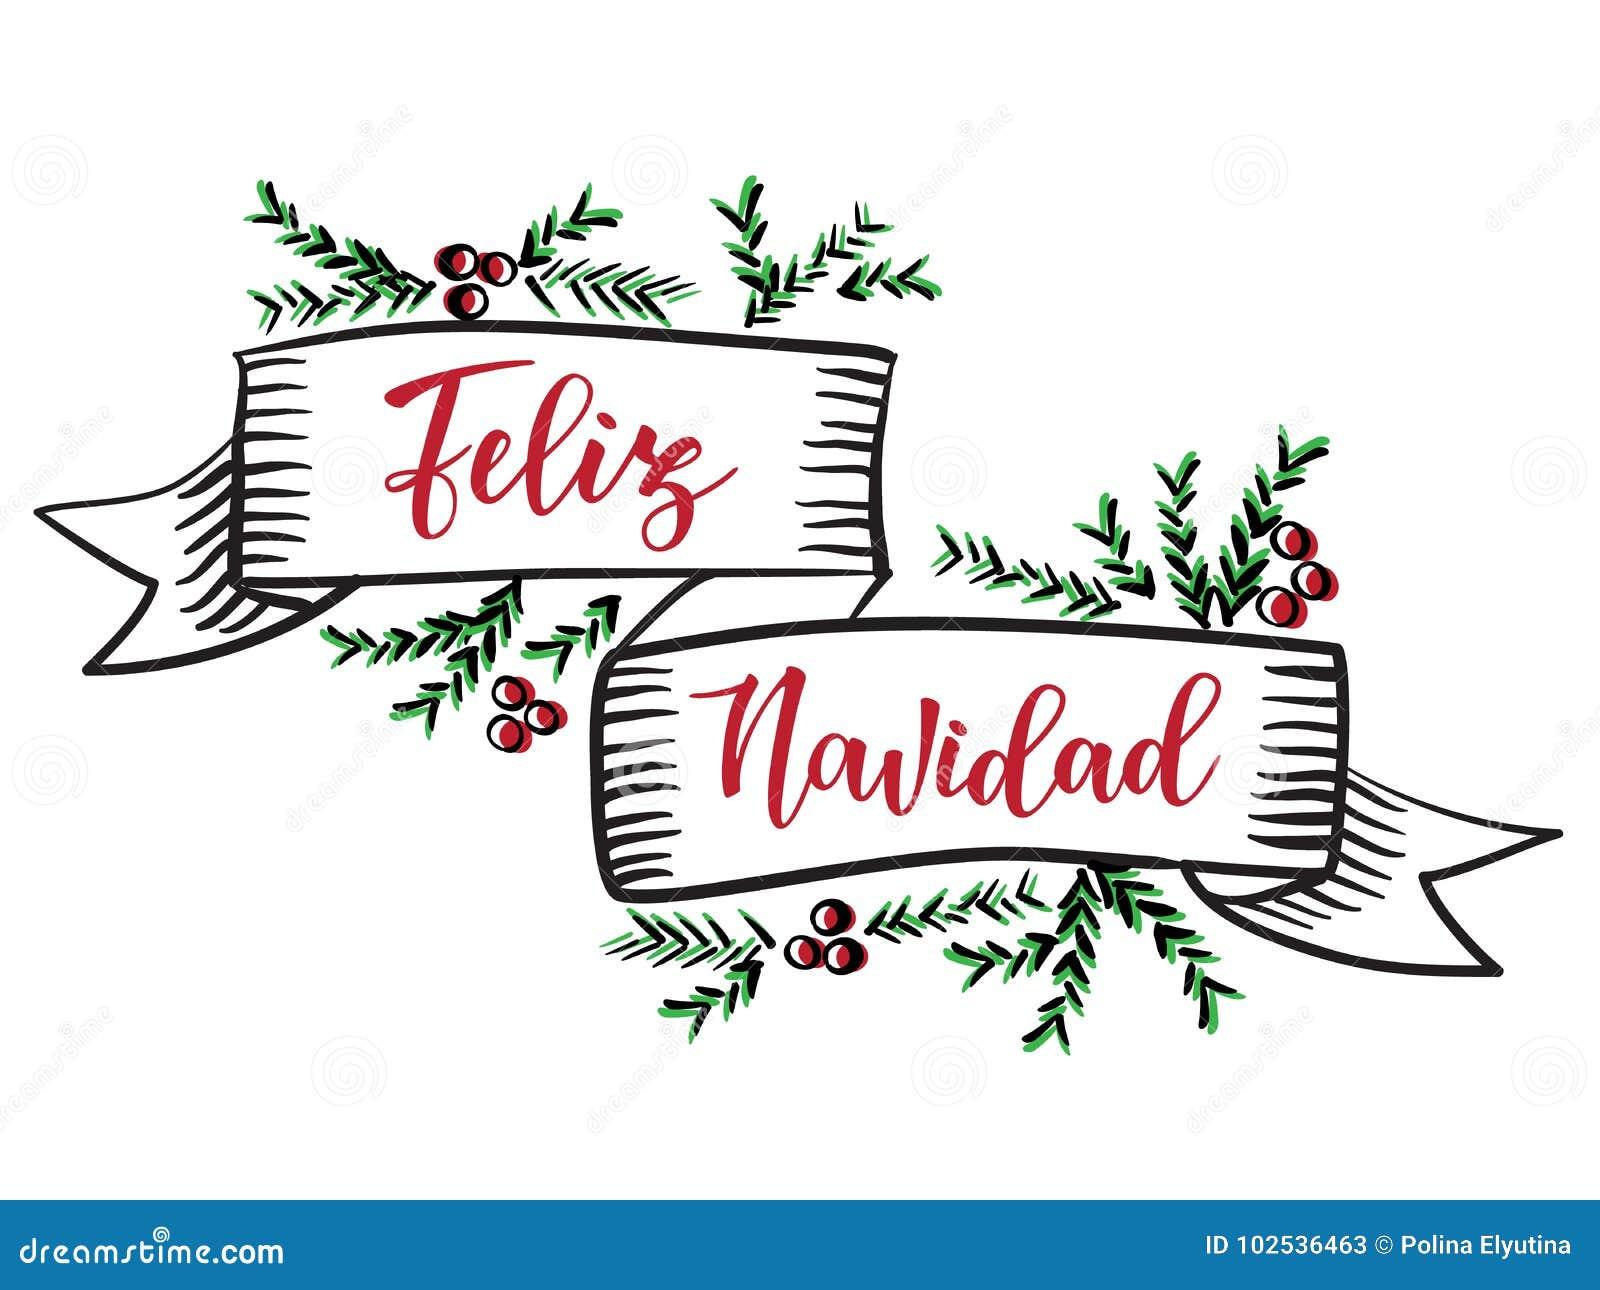 Feliz Navidad` Spanish Typography Lettering. Stock Vector ...